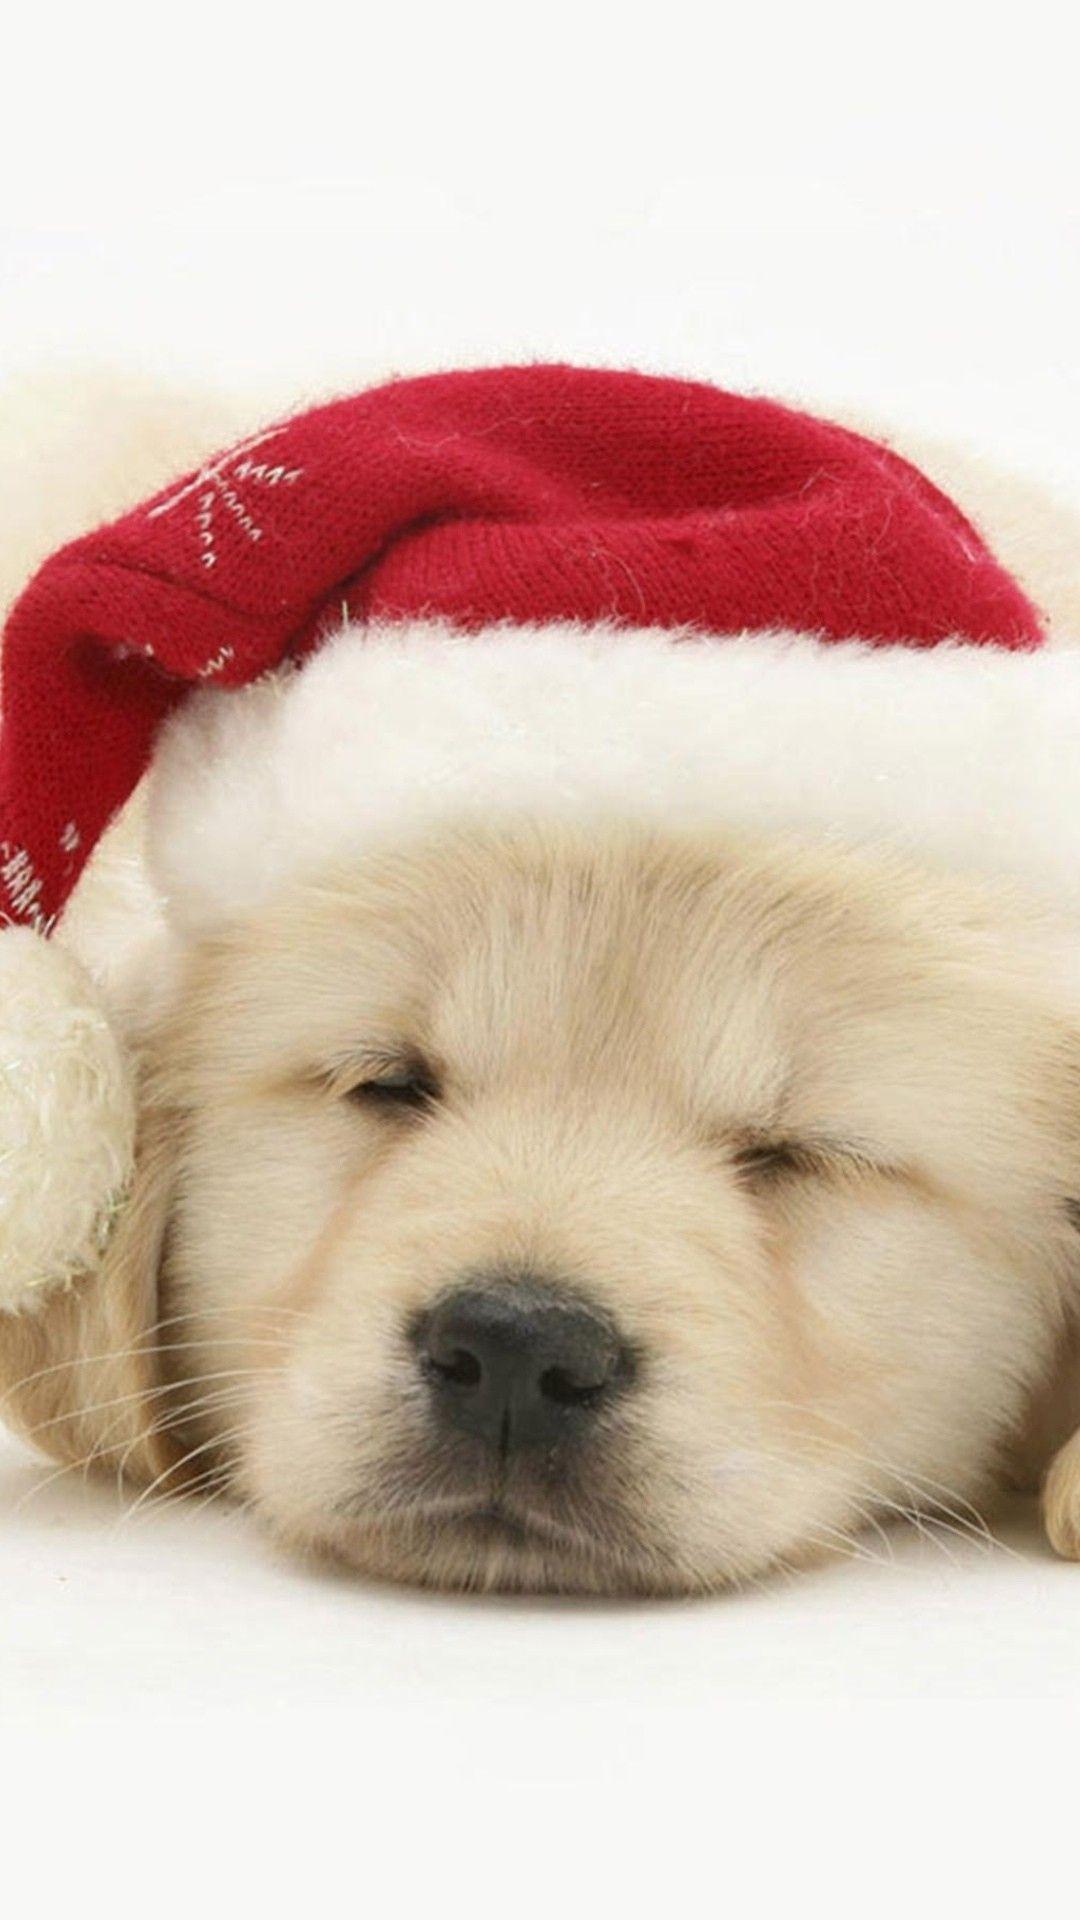 2014 Christmas Dog Santa Iphone 6 Plus Wallpaper 2014 Christmas